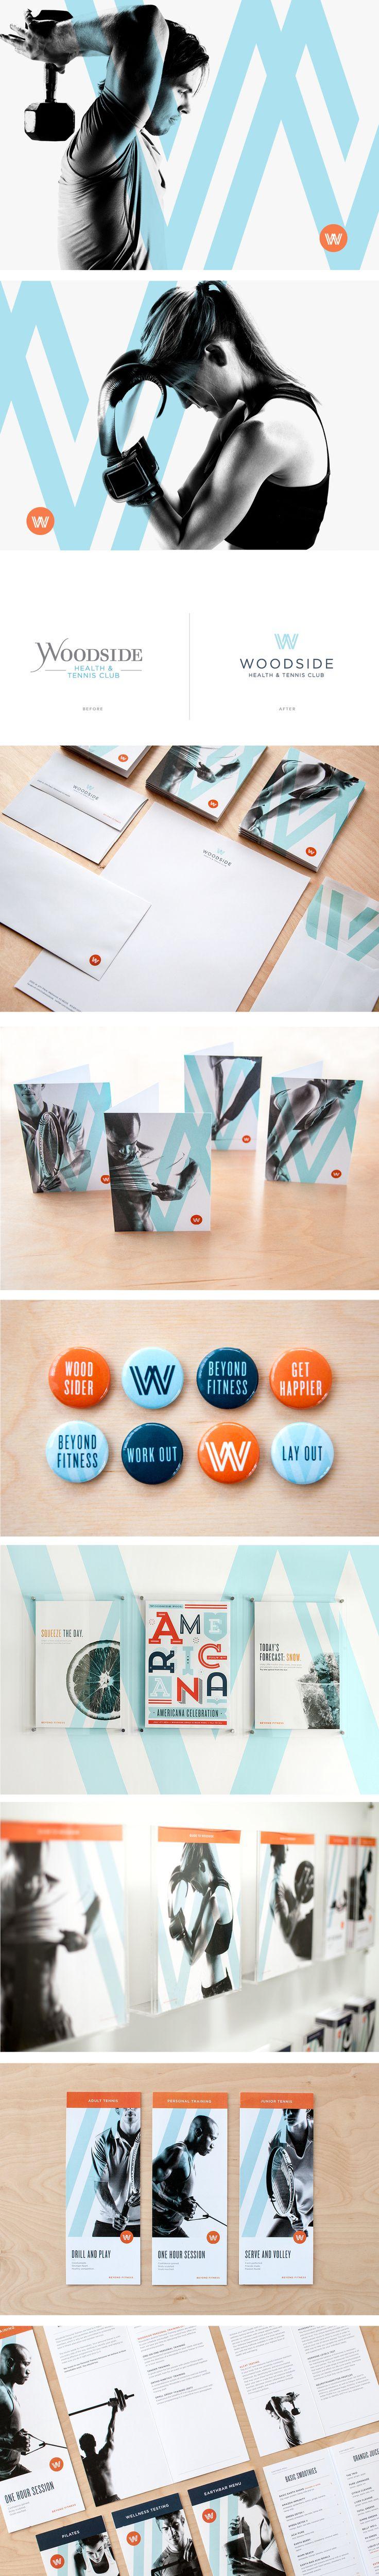 Woodside Health & Tennis Club | Art Direction Branding Copywriting Design Interior Integration Signage Wayfinding Website | Design Ranch